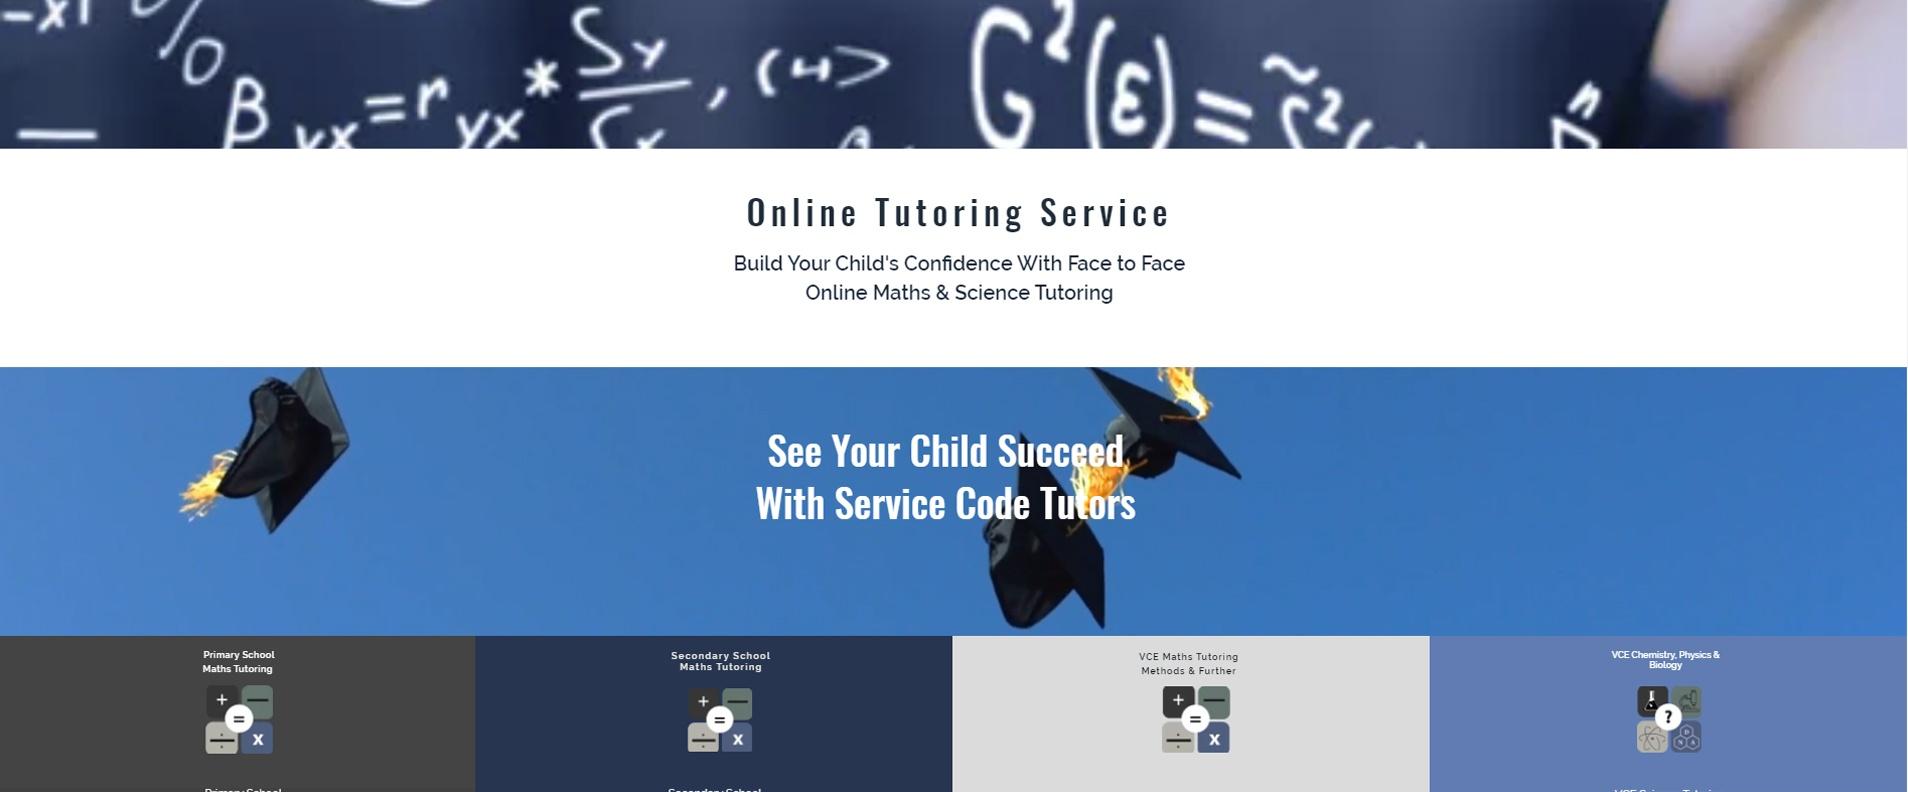 Service code tutors